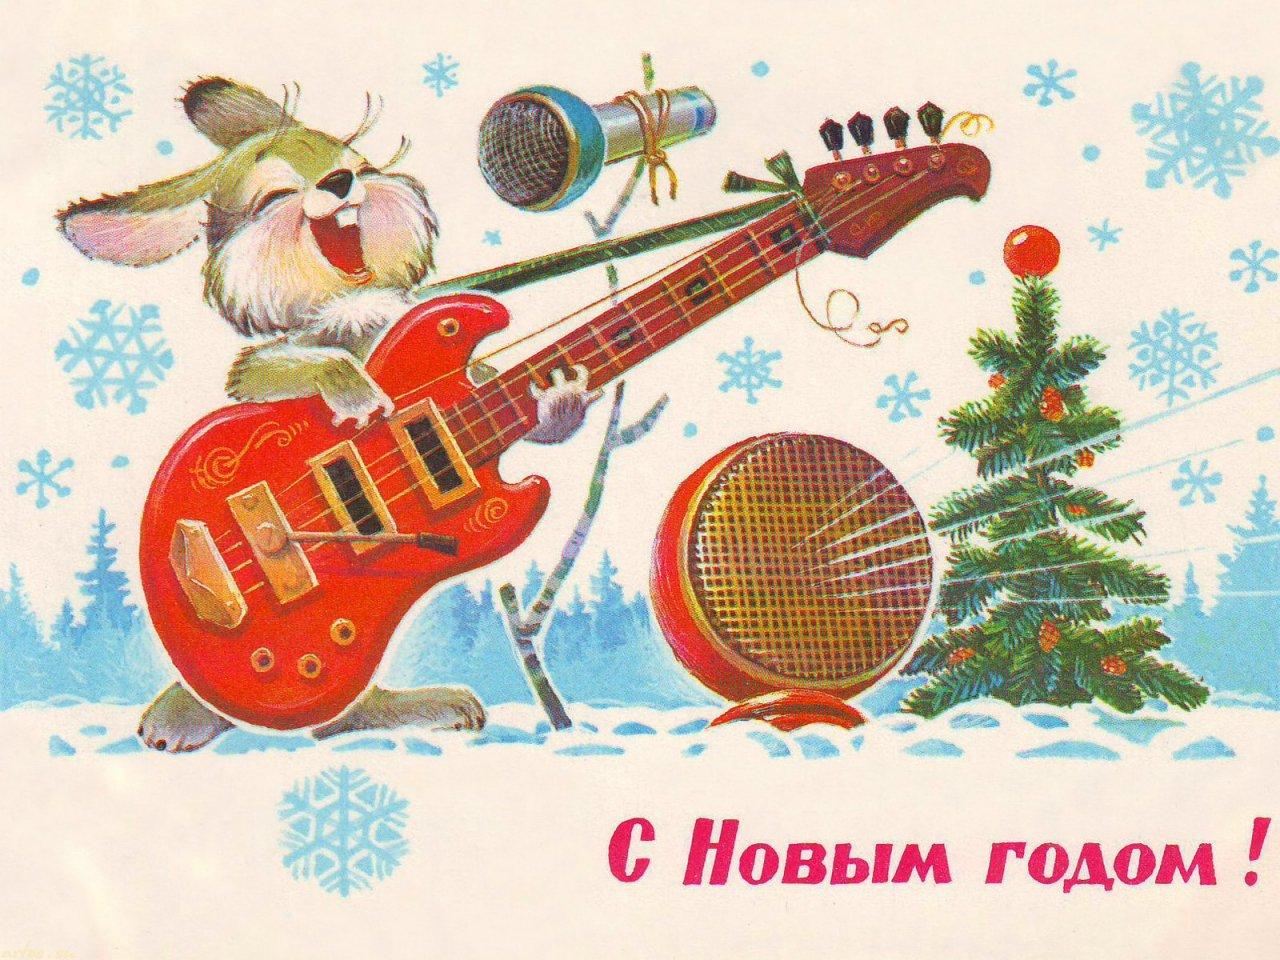 Чапаев, Василий Иванович Википедия